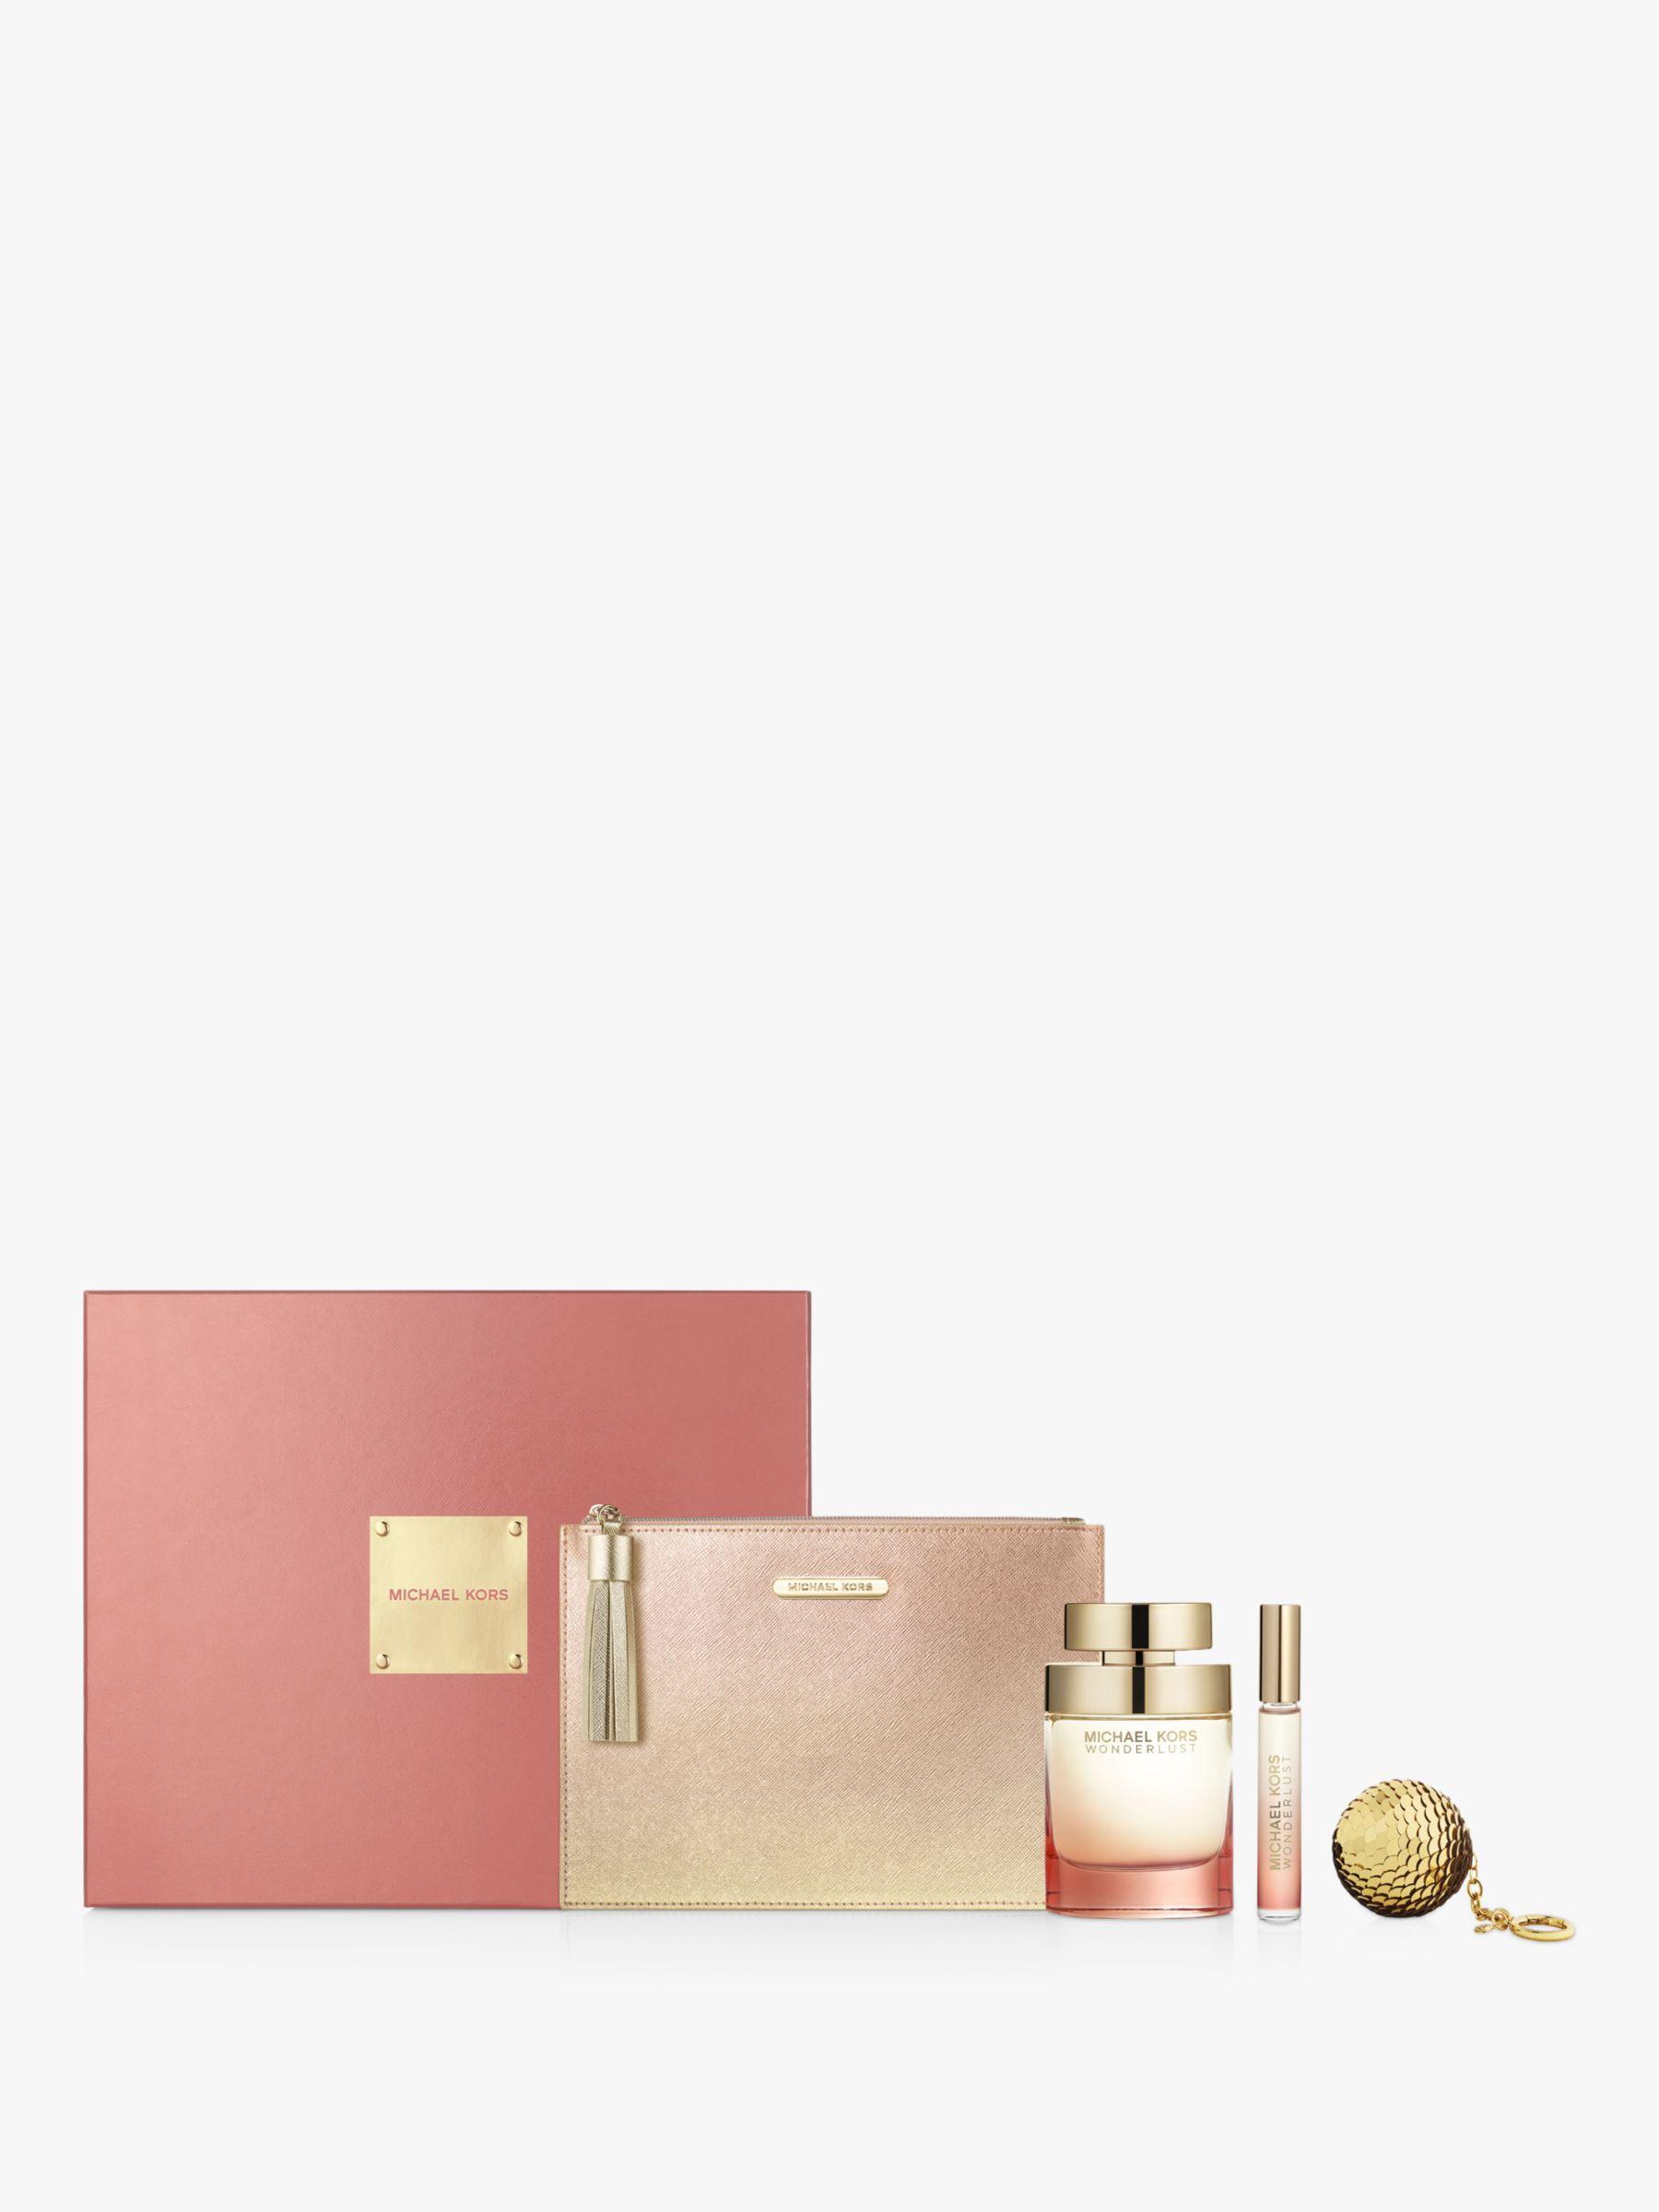 dac9bbf74310 Michael Kors Wonderlust Eau de Parfum 100ml Gift Set at John Lewis    Partners